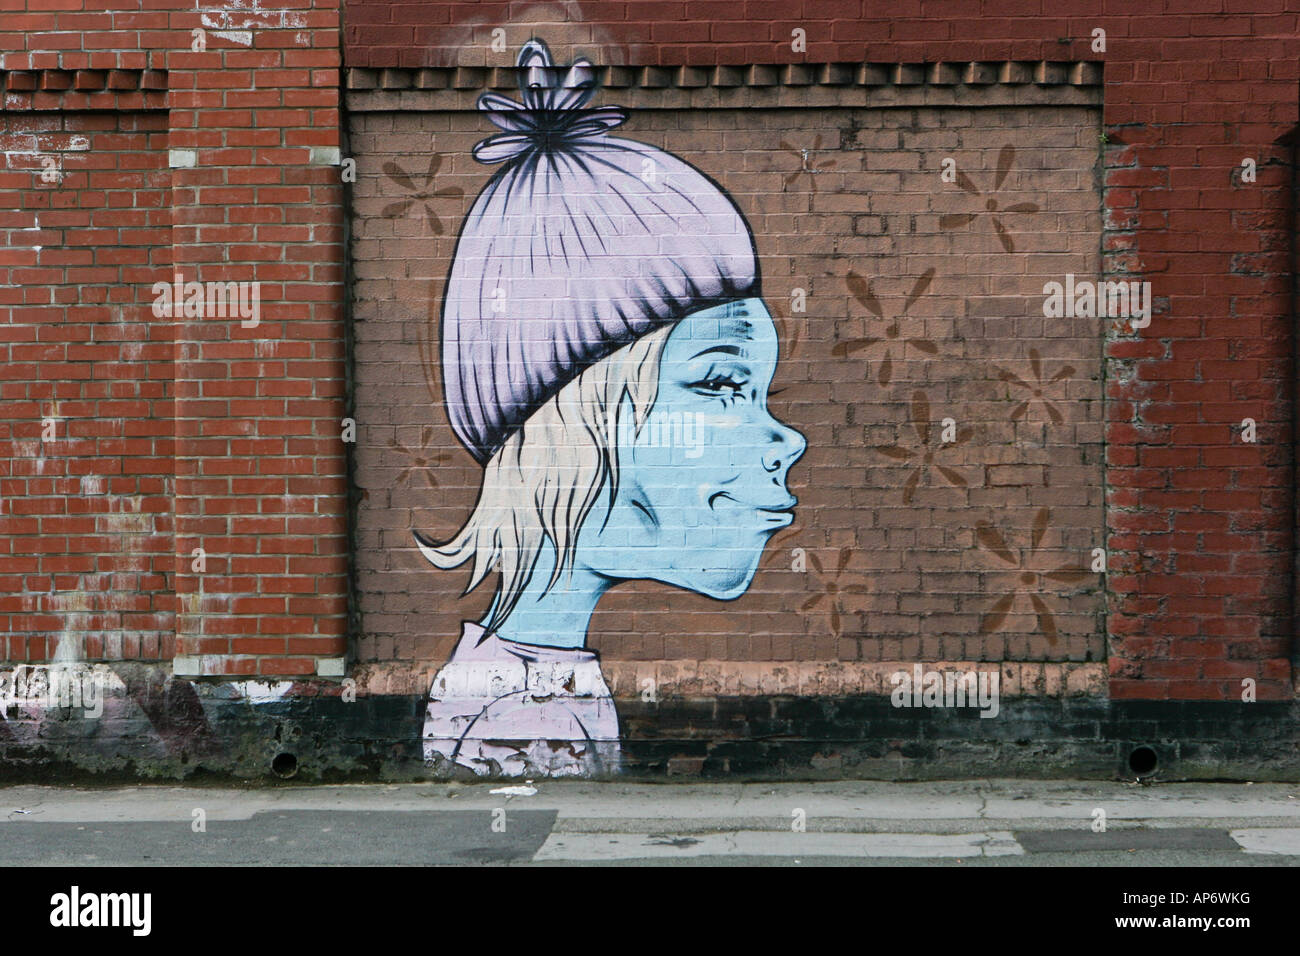 Graffiti wall cambridge - Graffiti On Wall In Cambridge Street Manchester Uk